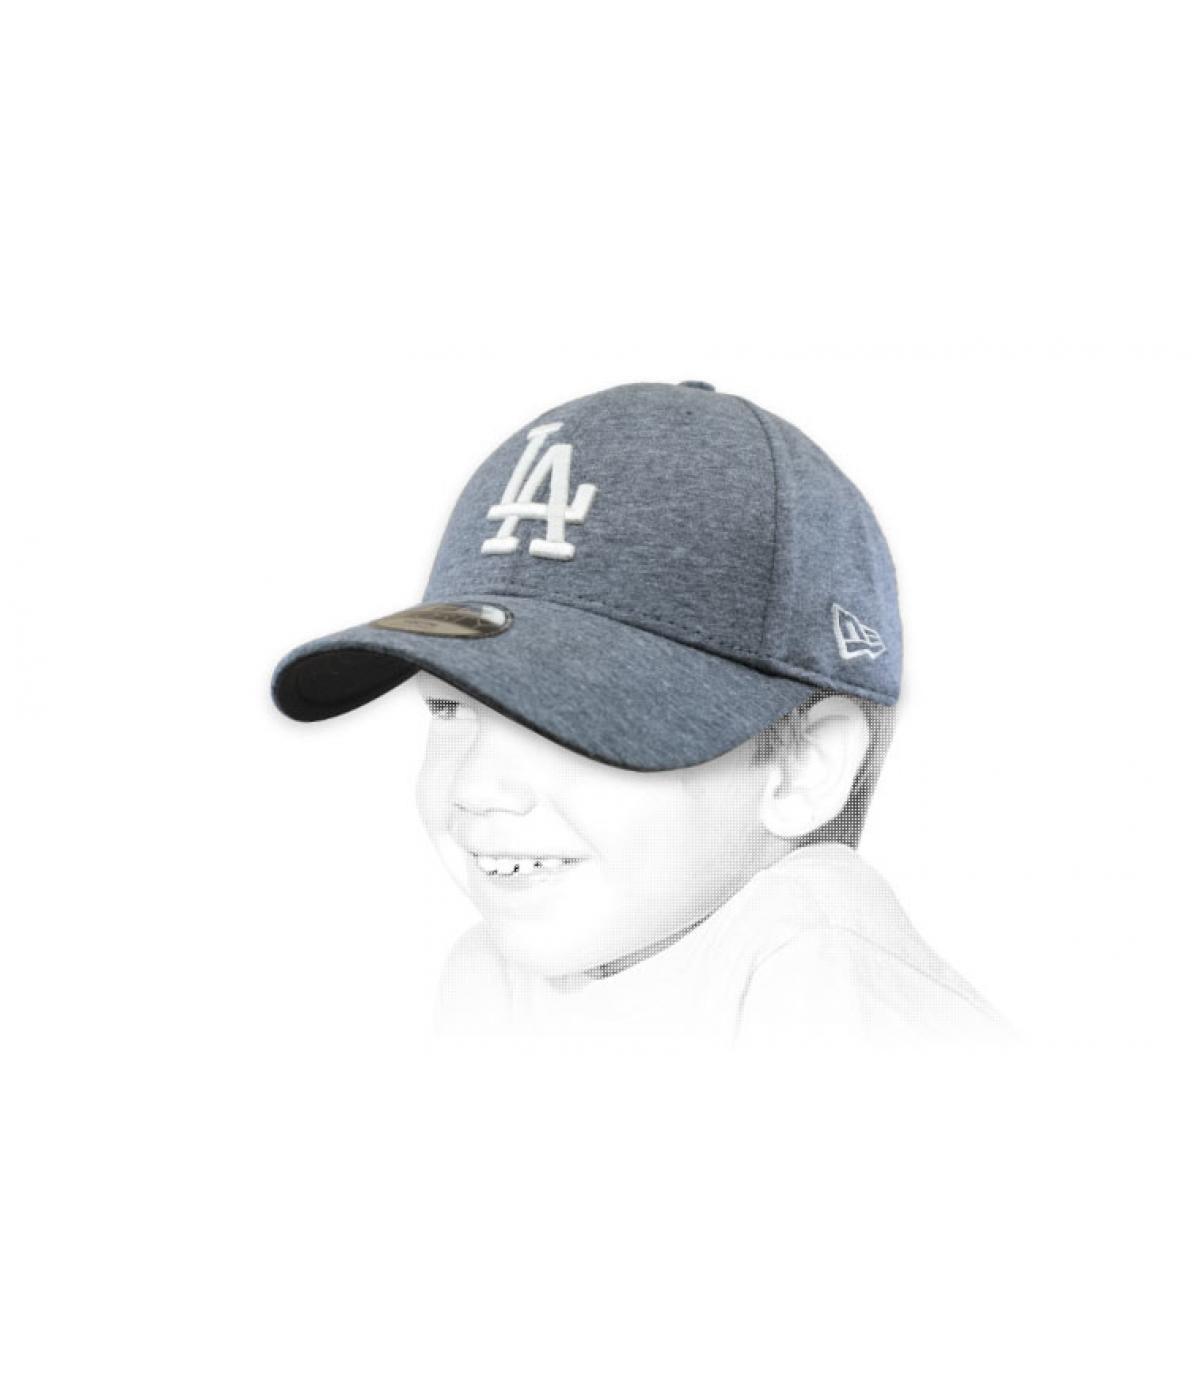 grey LA child cap